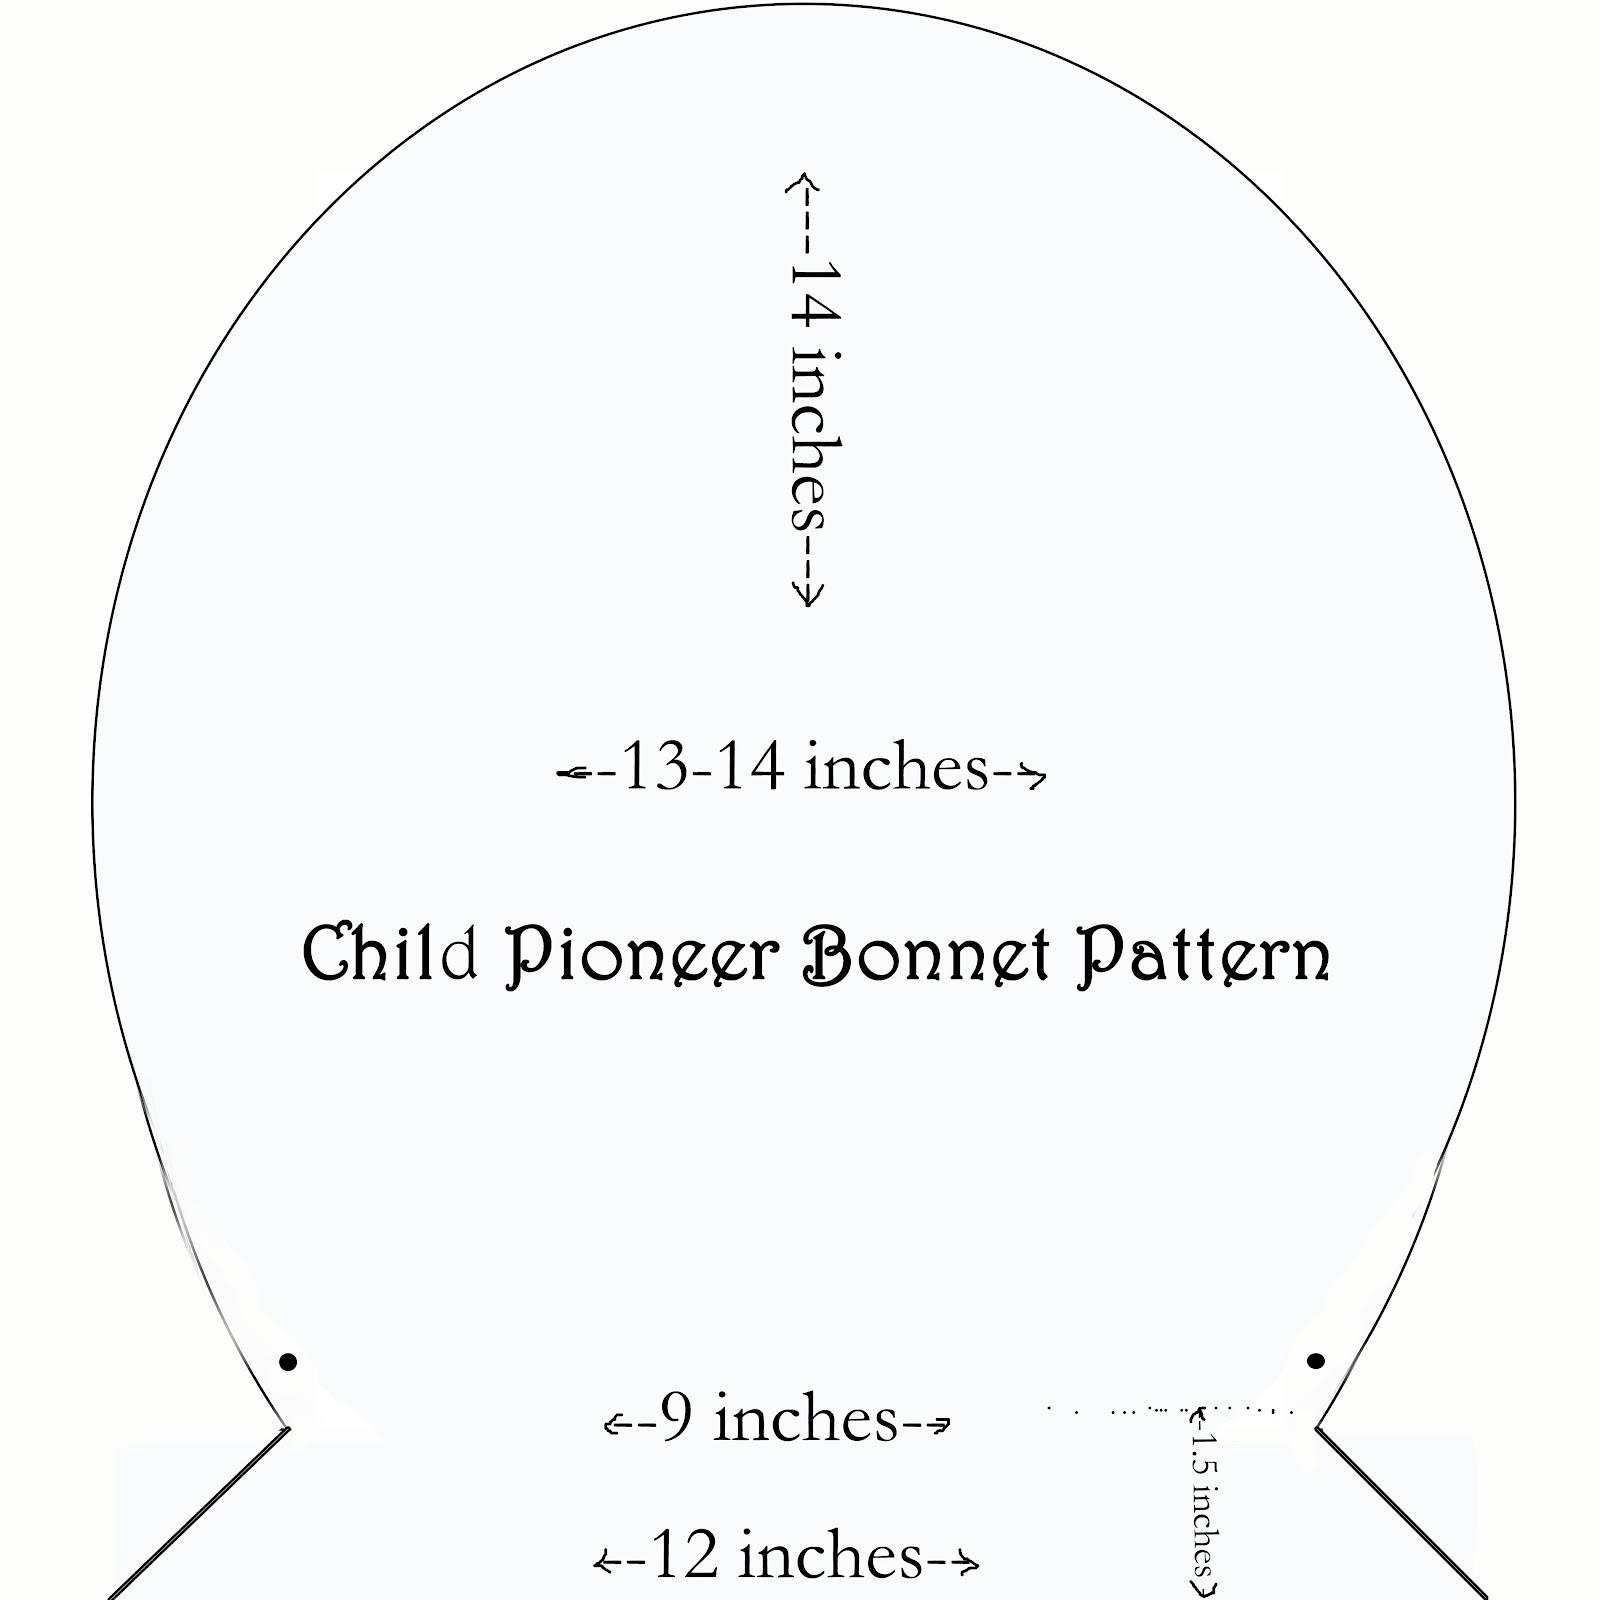 bonnet pattern sewing printable pioneer bonnet pattern amish bonnet ...